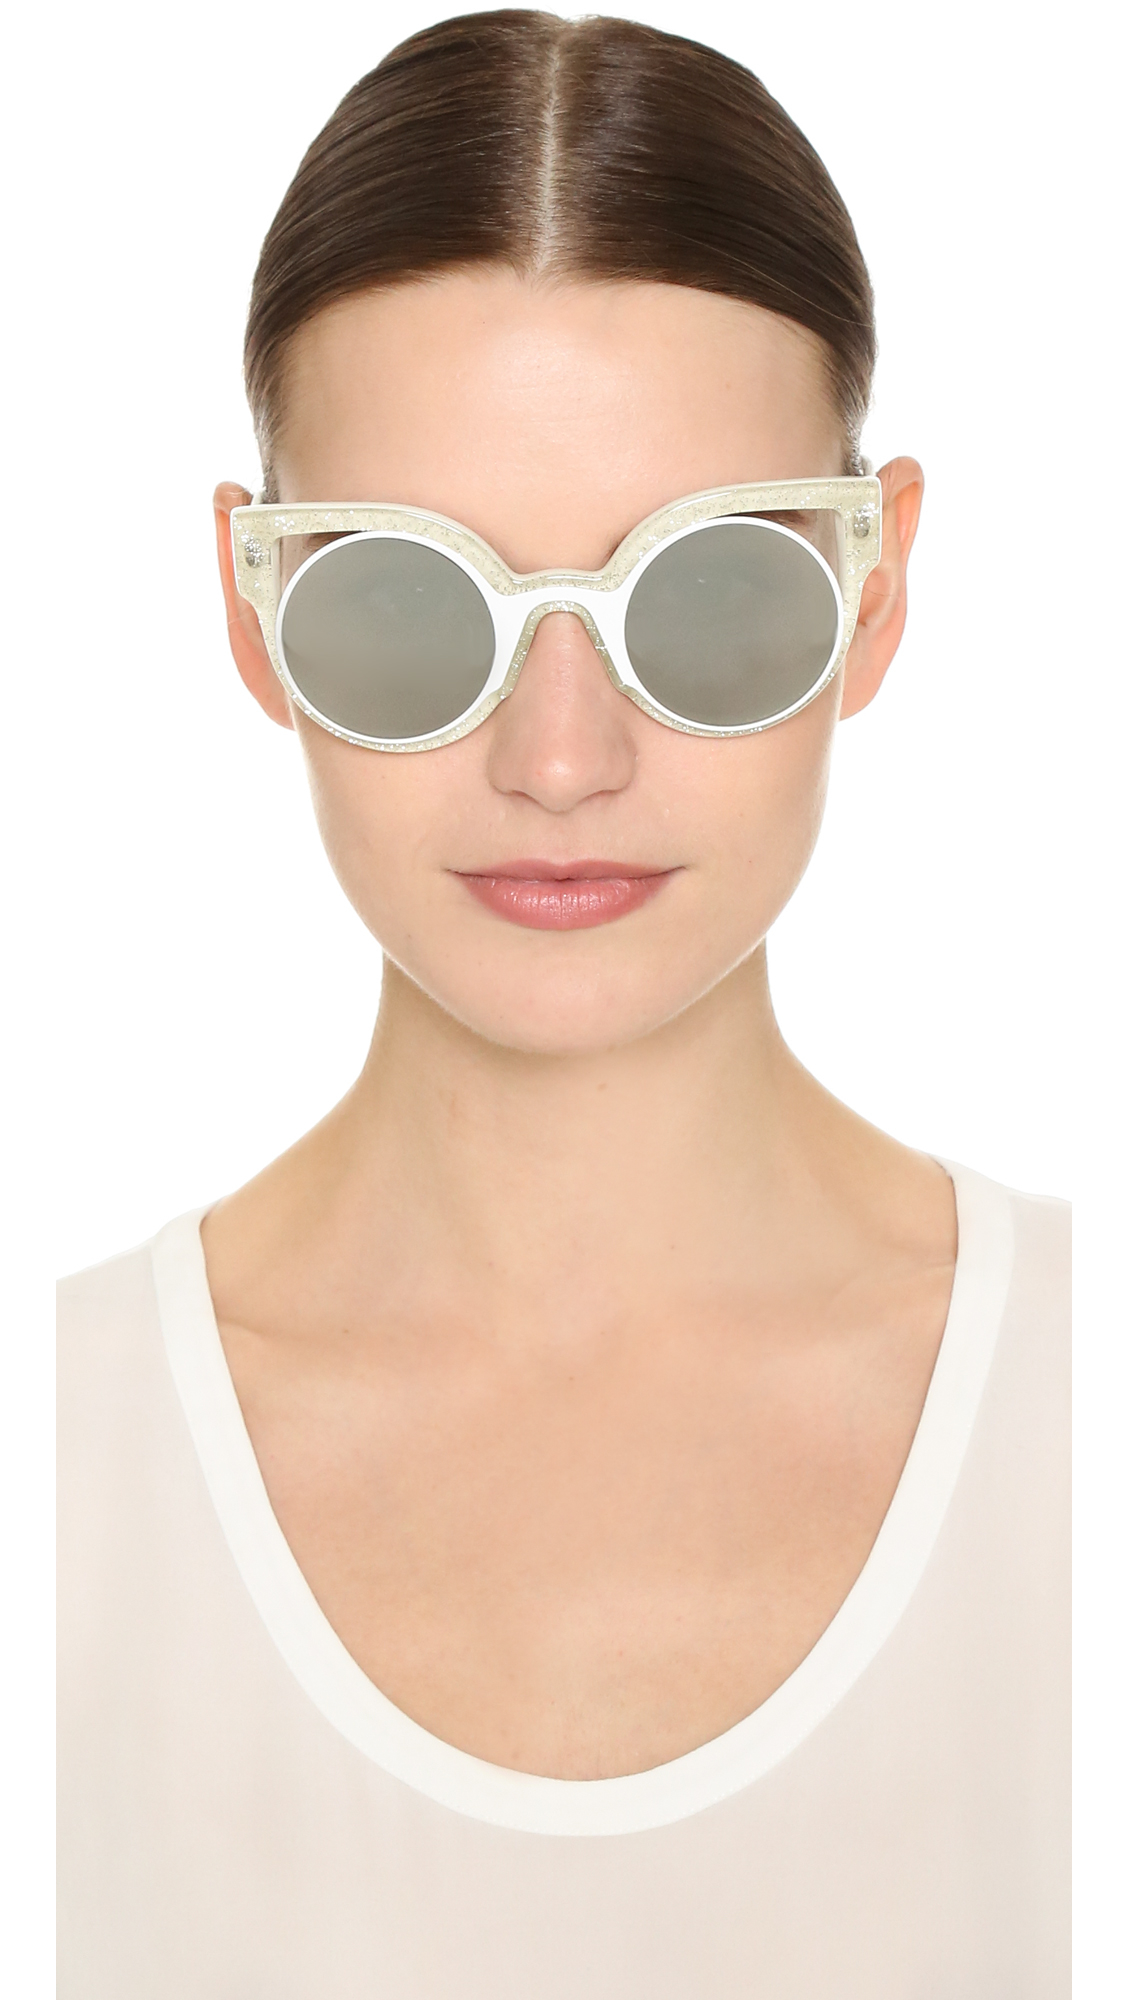 f5b4b0dd97735 Fendi Women s Oversized Sunglasses